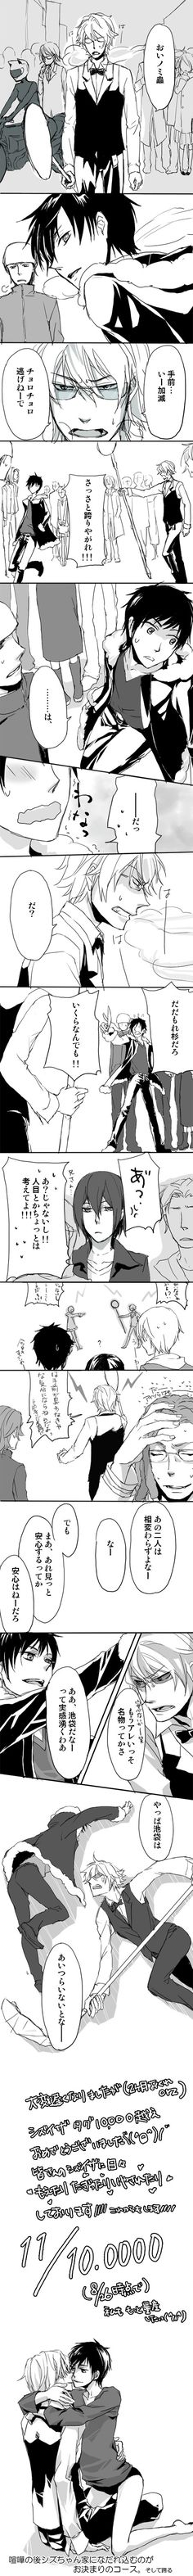 Shizu vs Iza